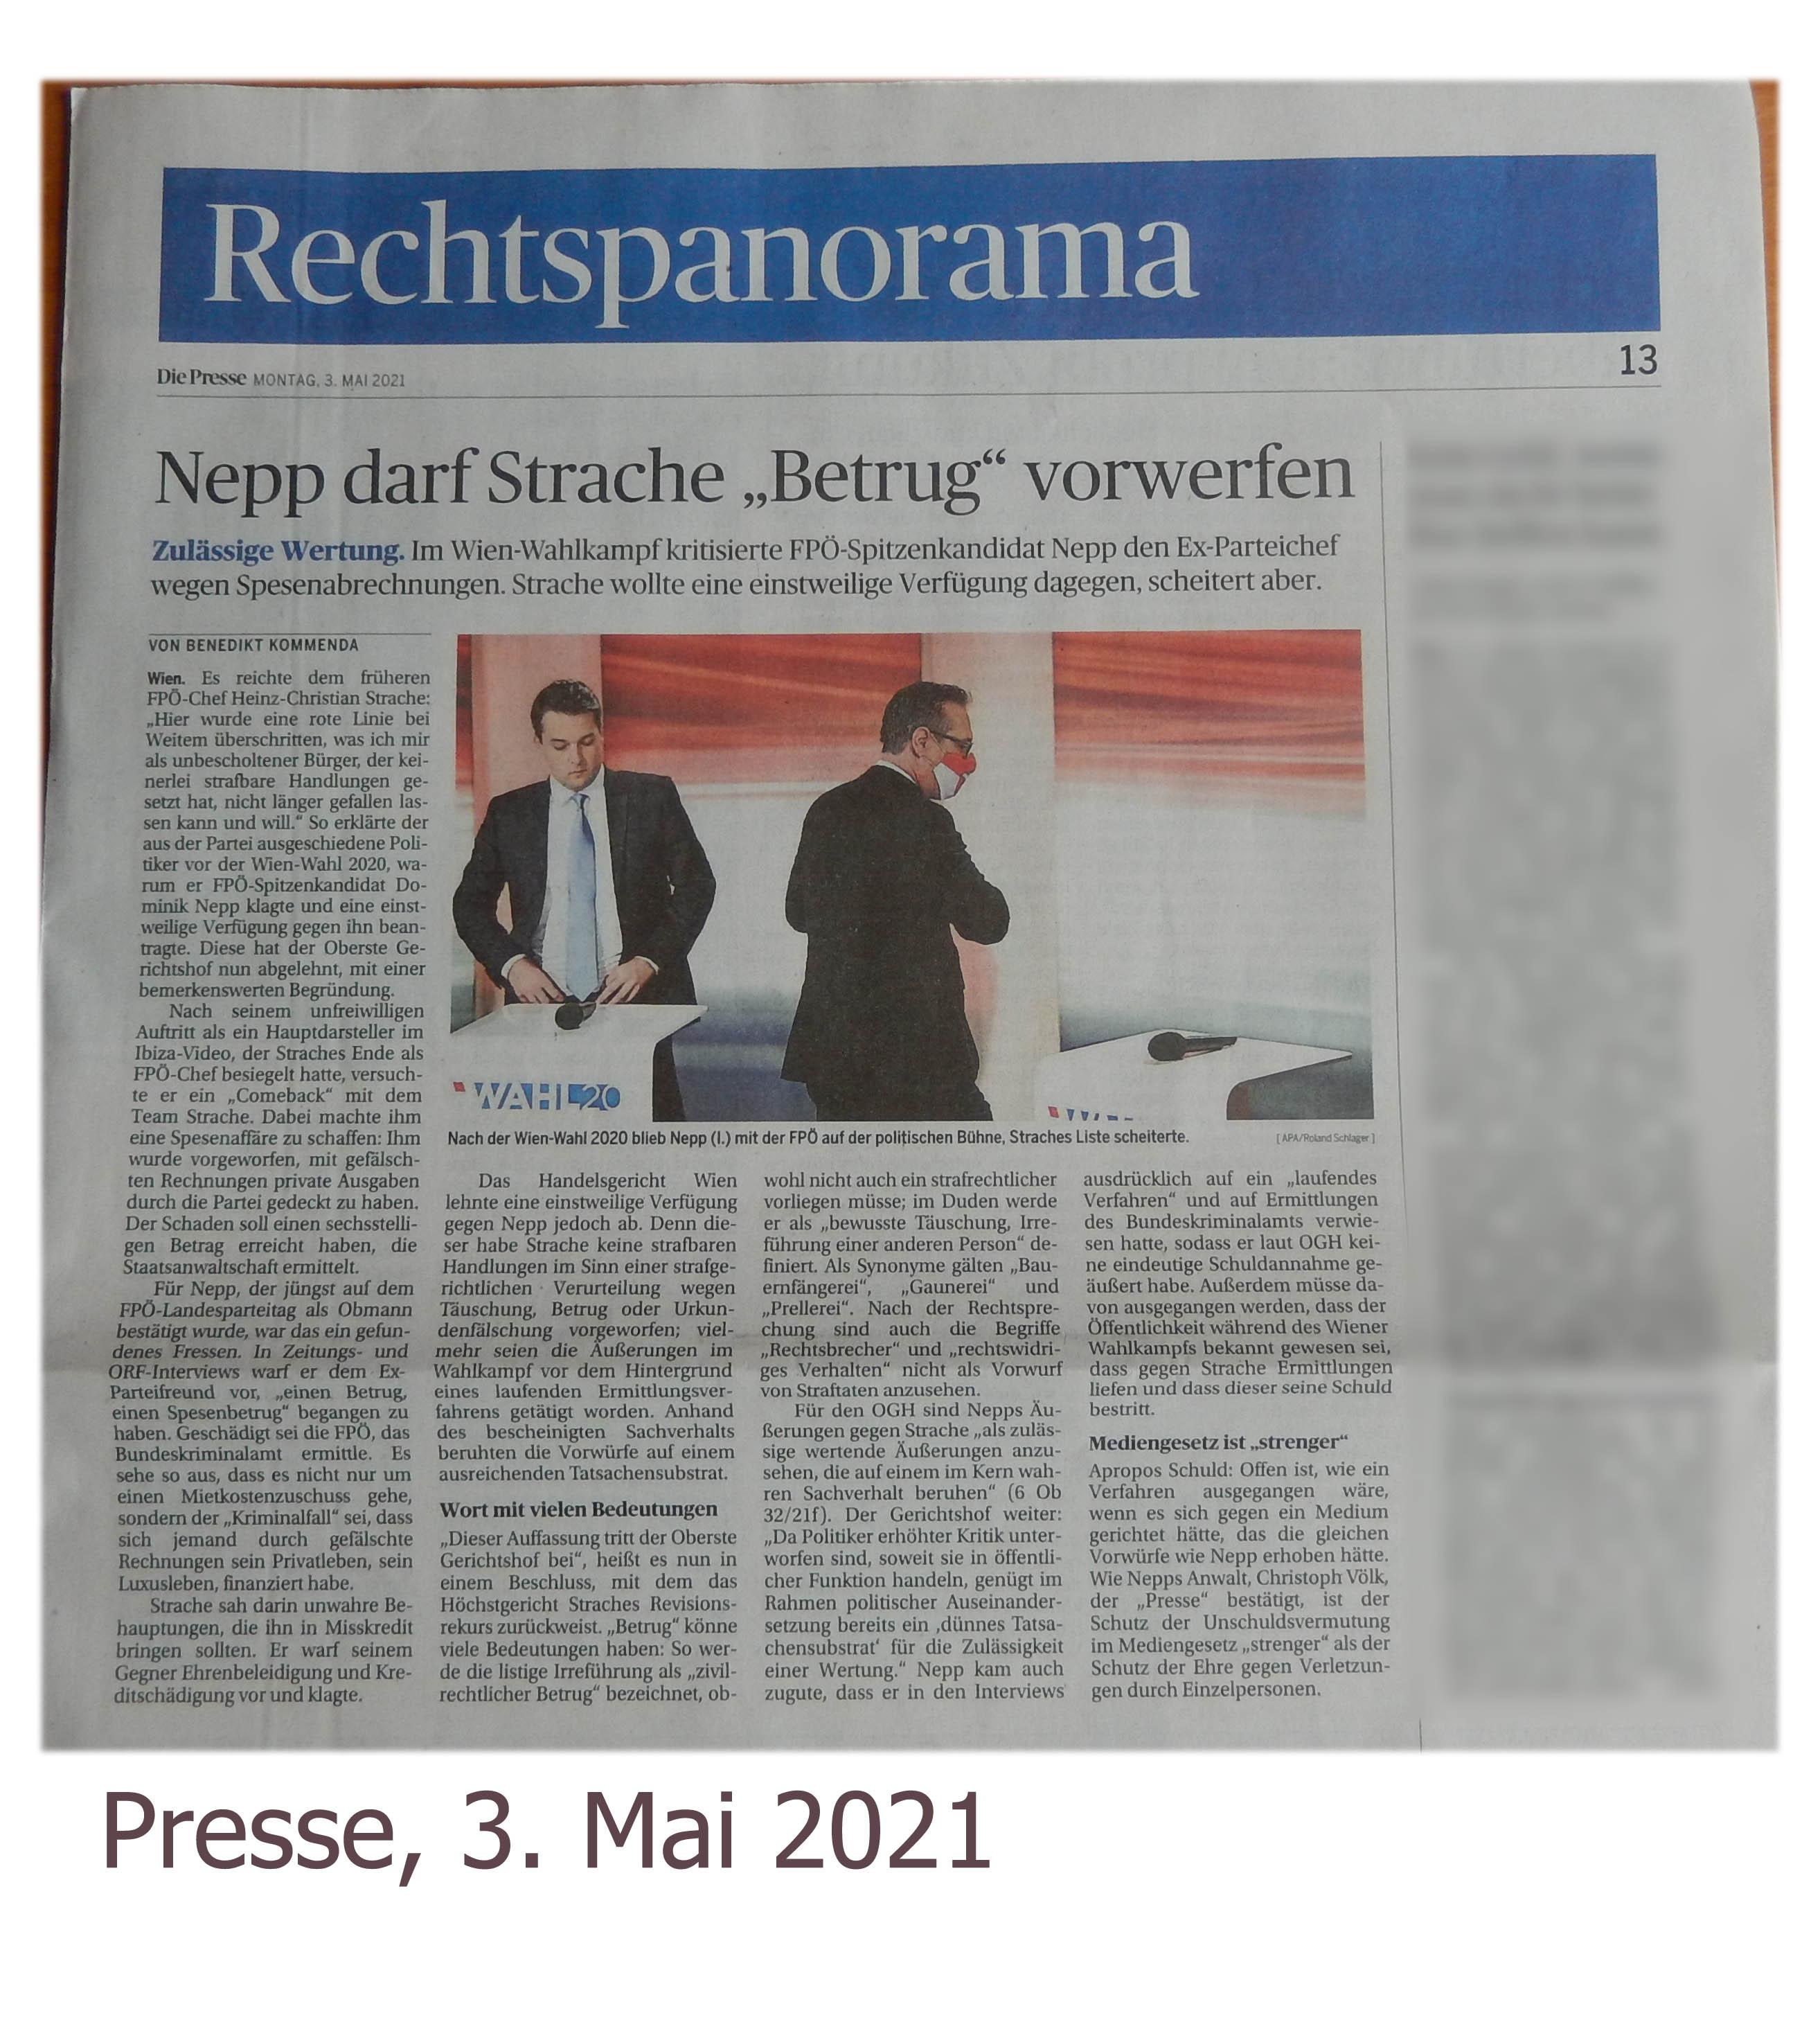 210503-presse-strache-nepp_